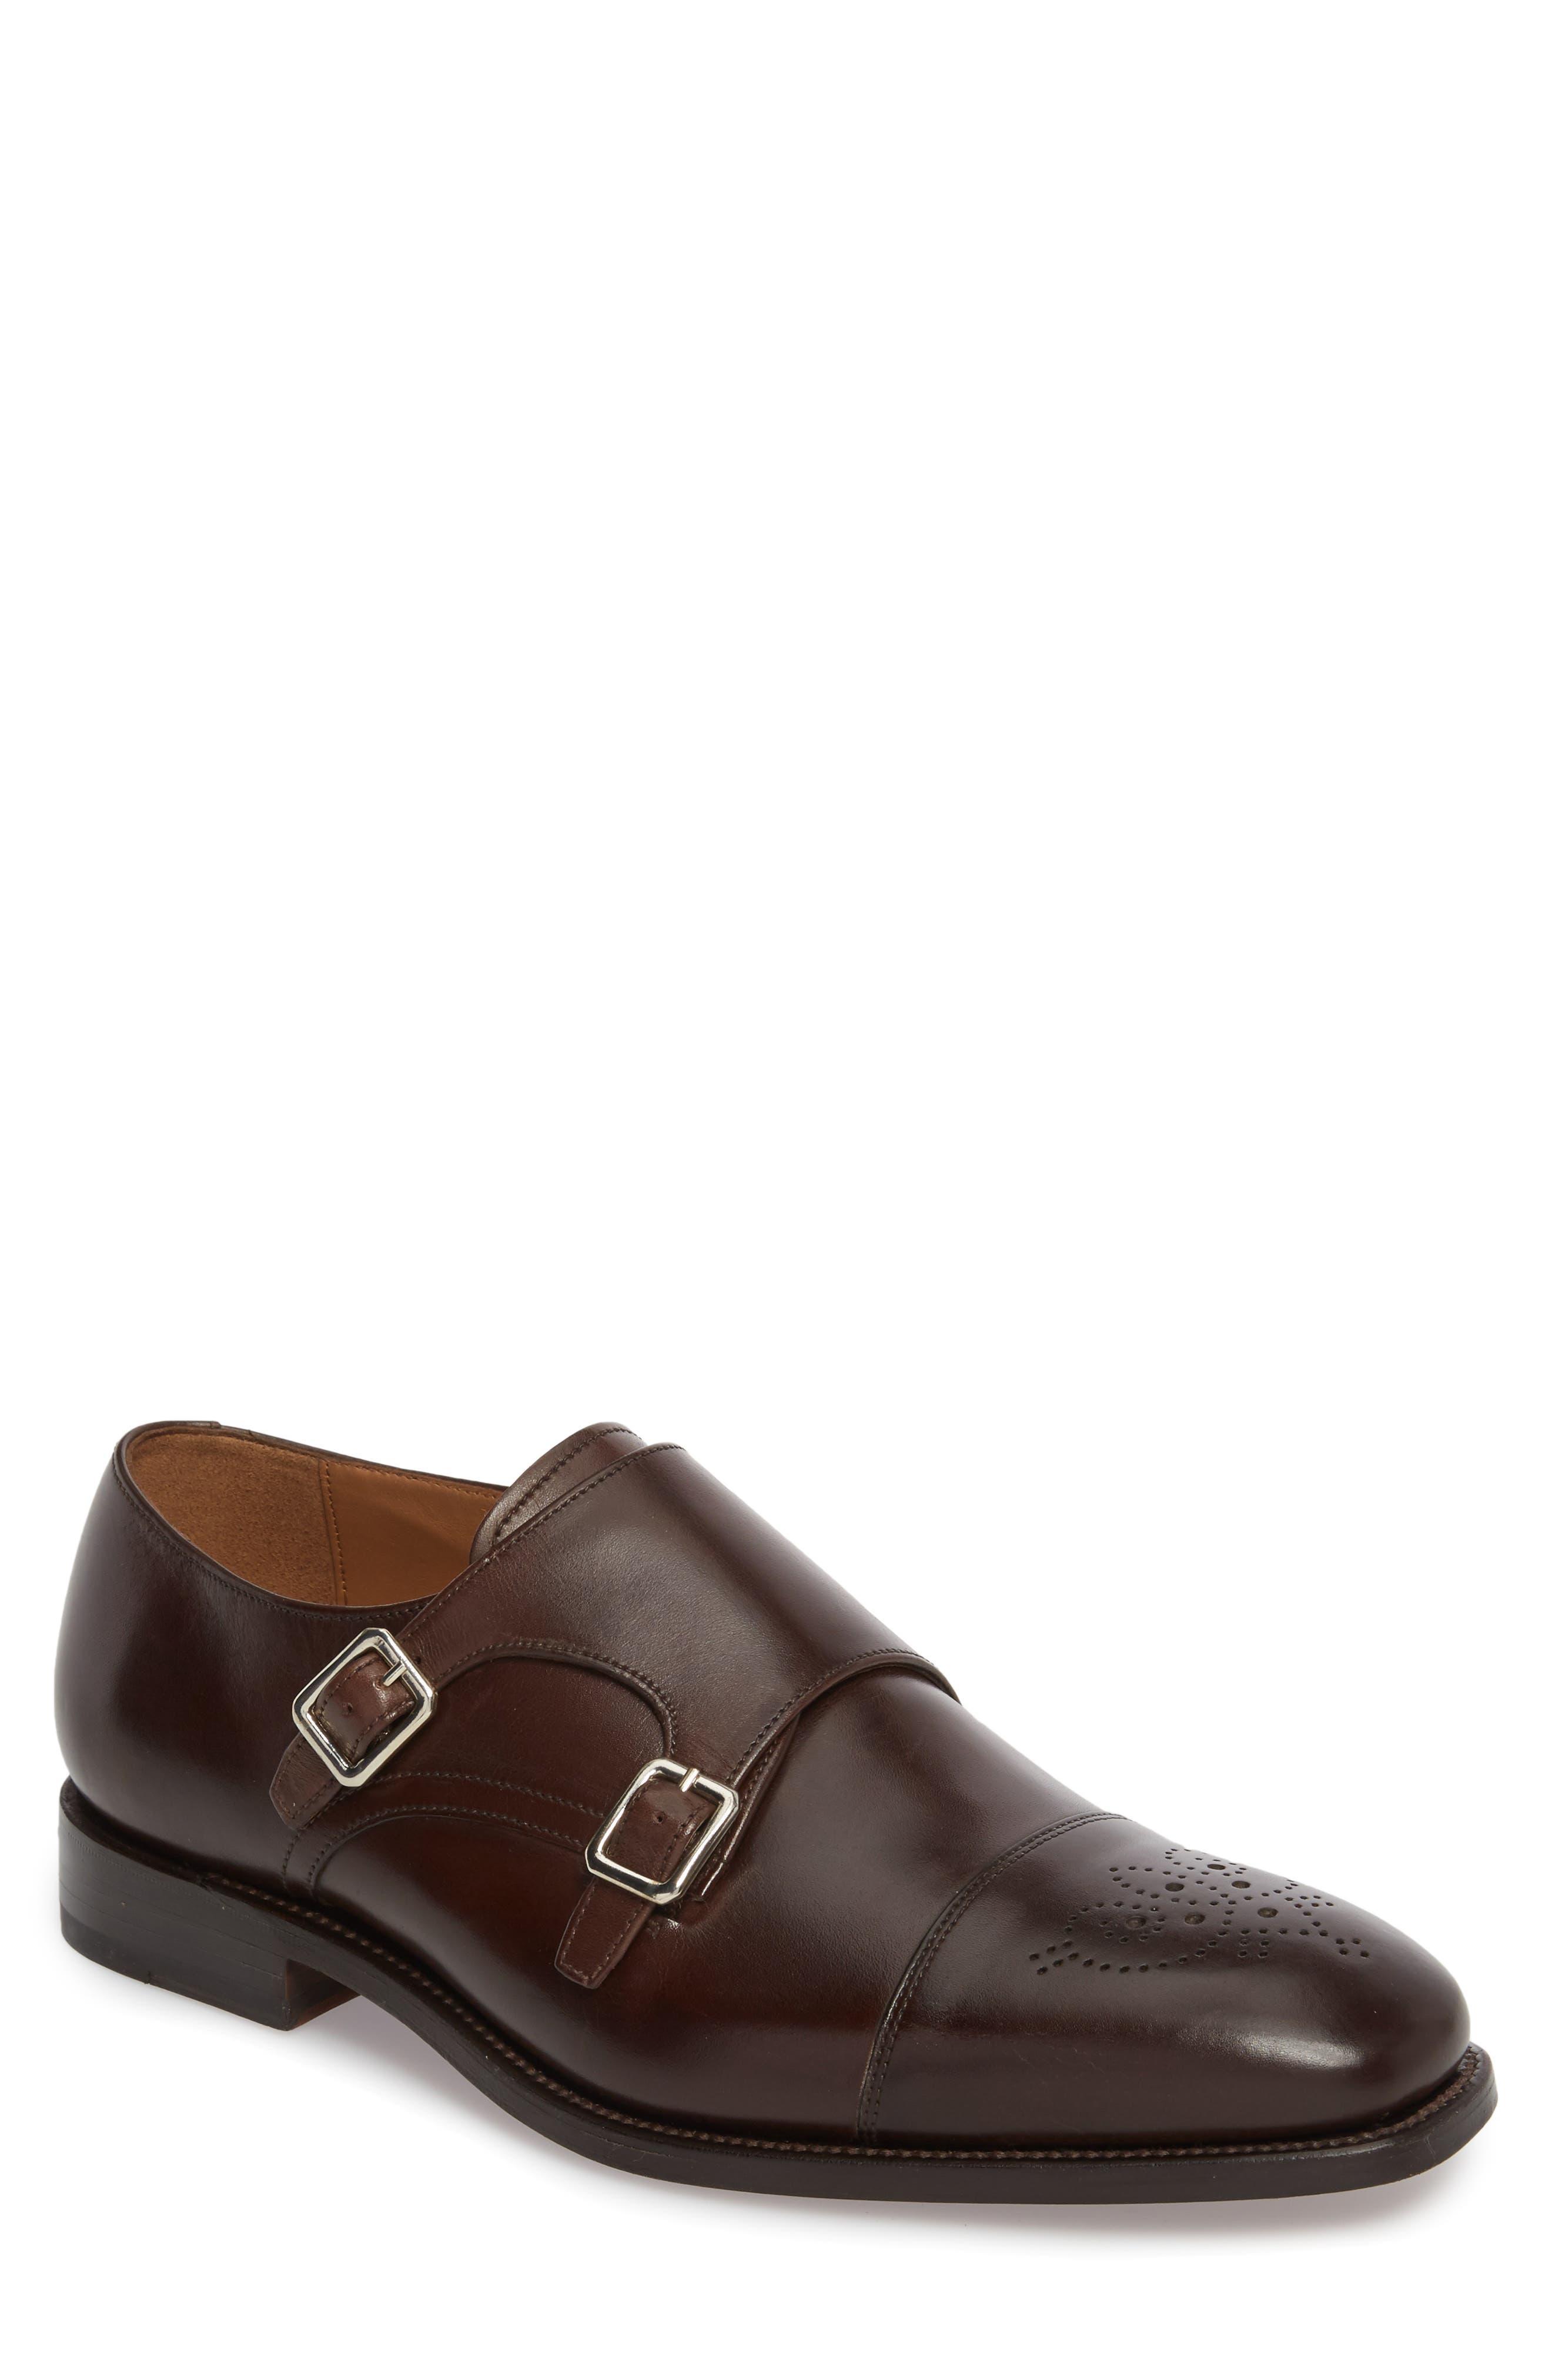 Sausalito Double Monk Strap Shoe,                         Main,                         color, Coffee